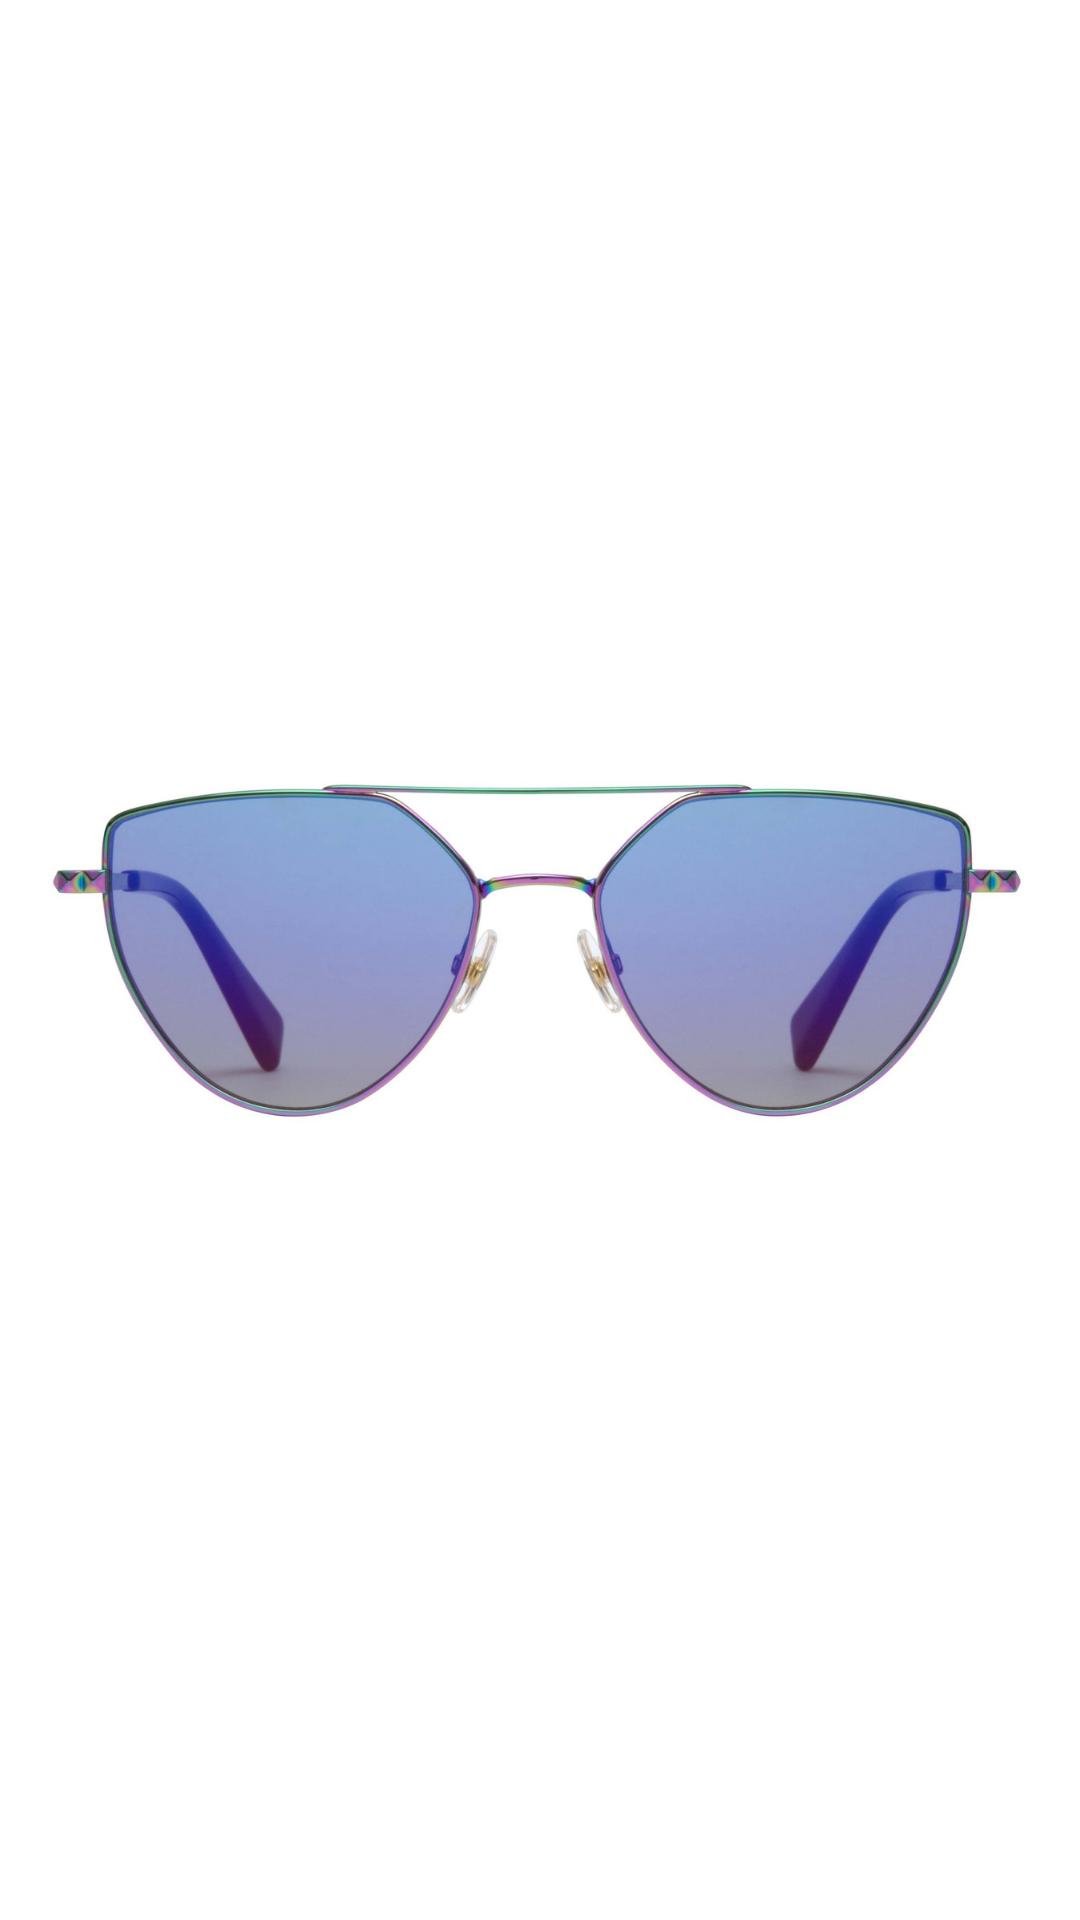 78447f7fd16e1 Stevie Metal Geometric Sunglasses